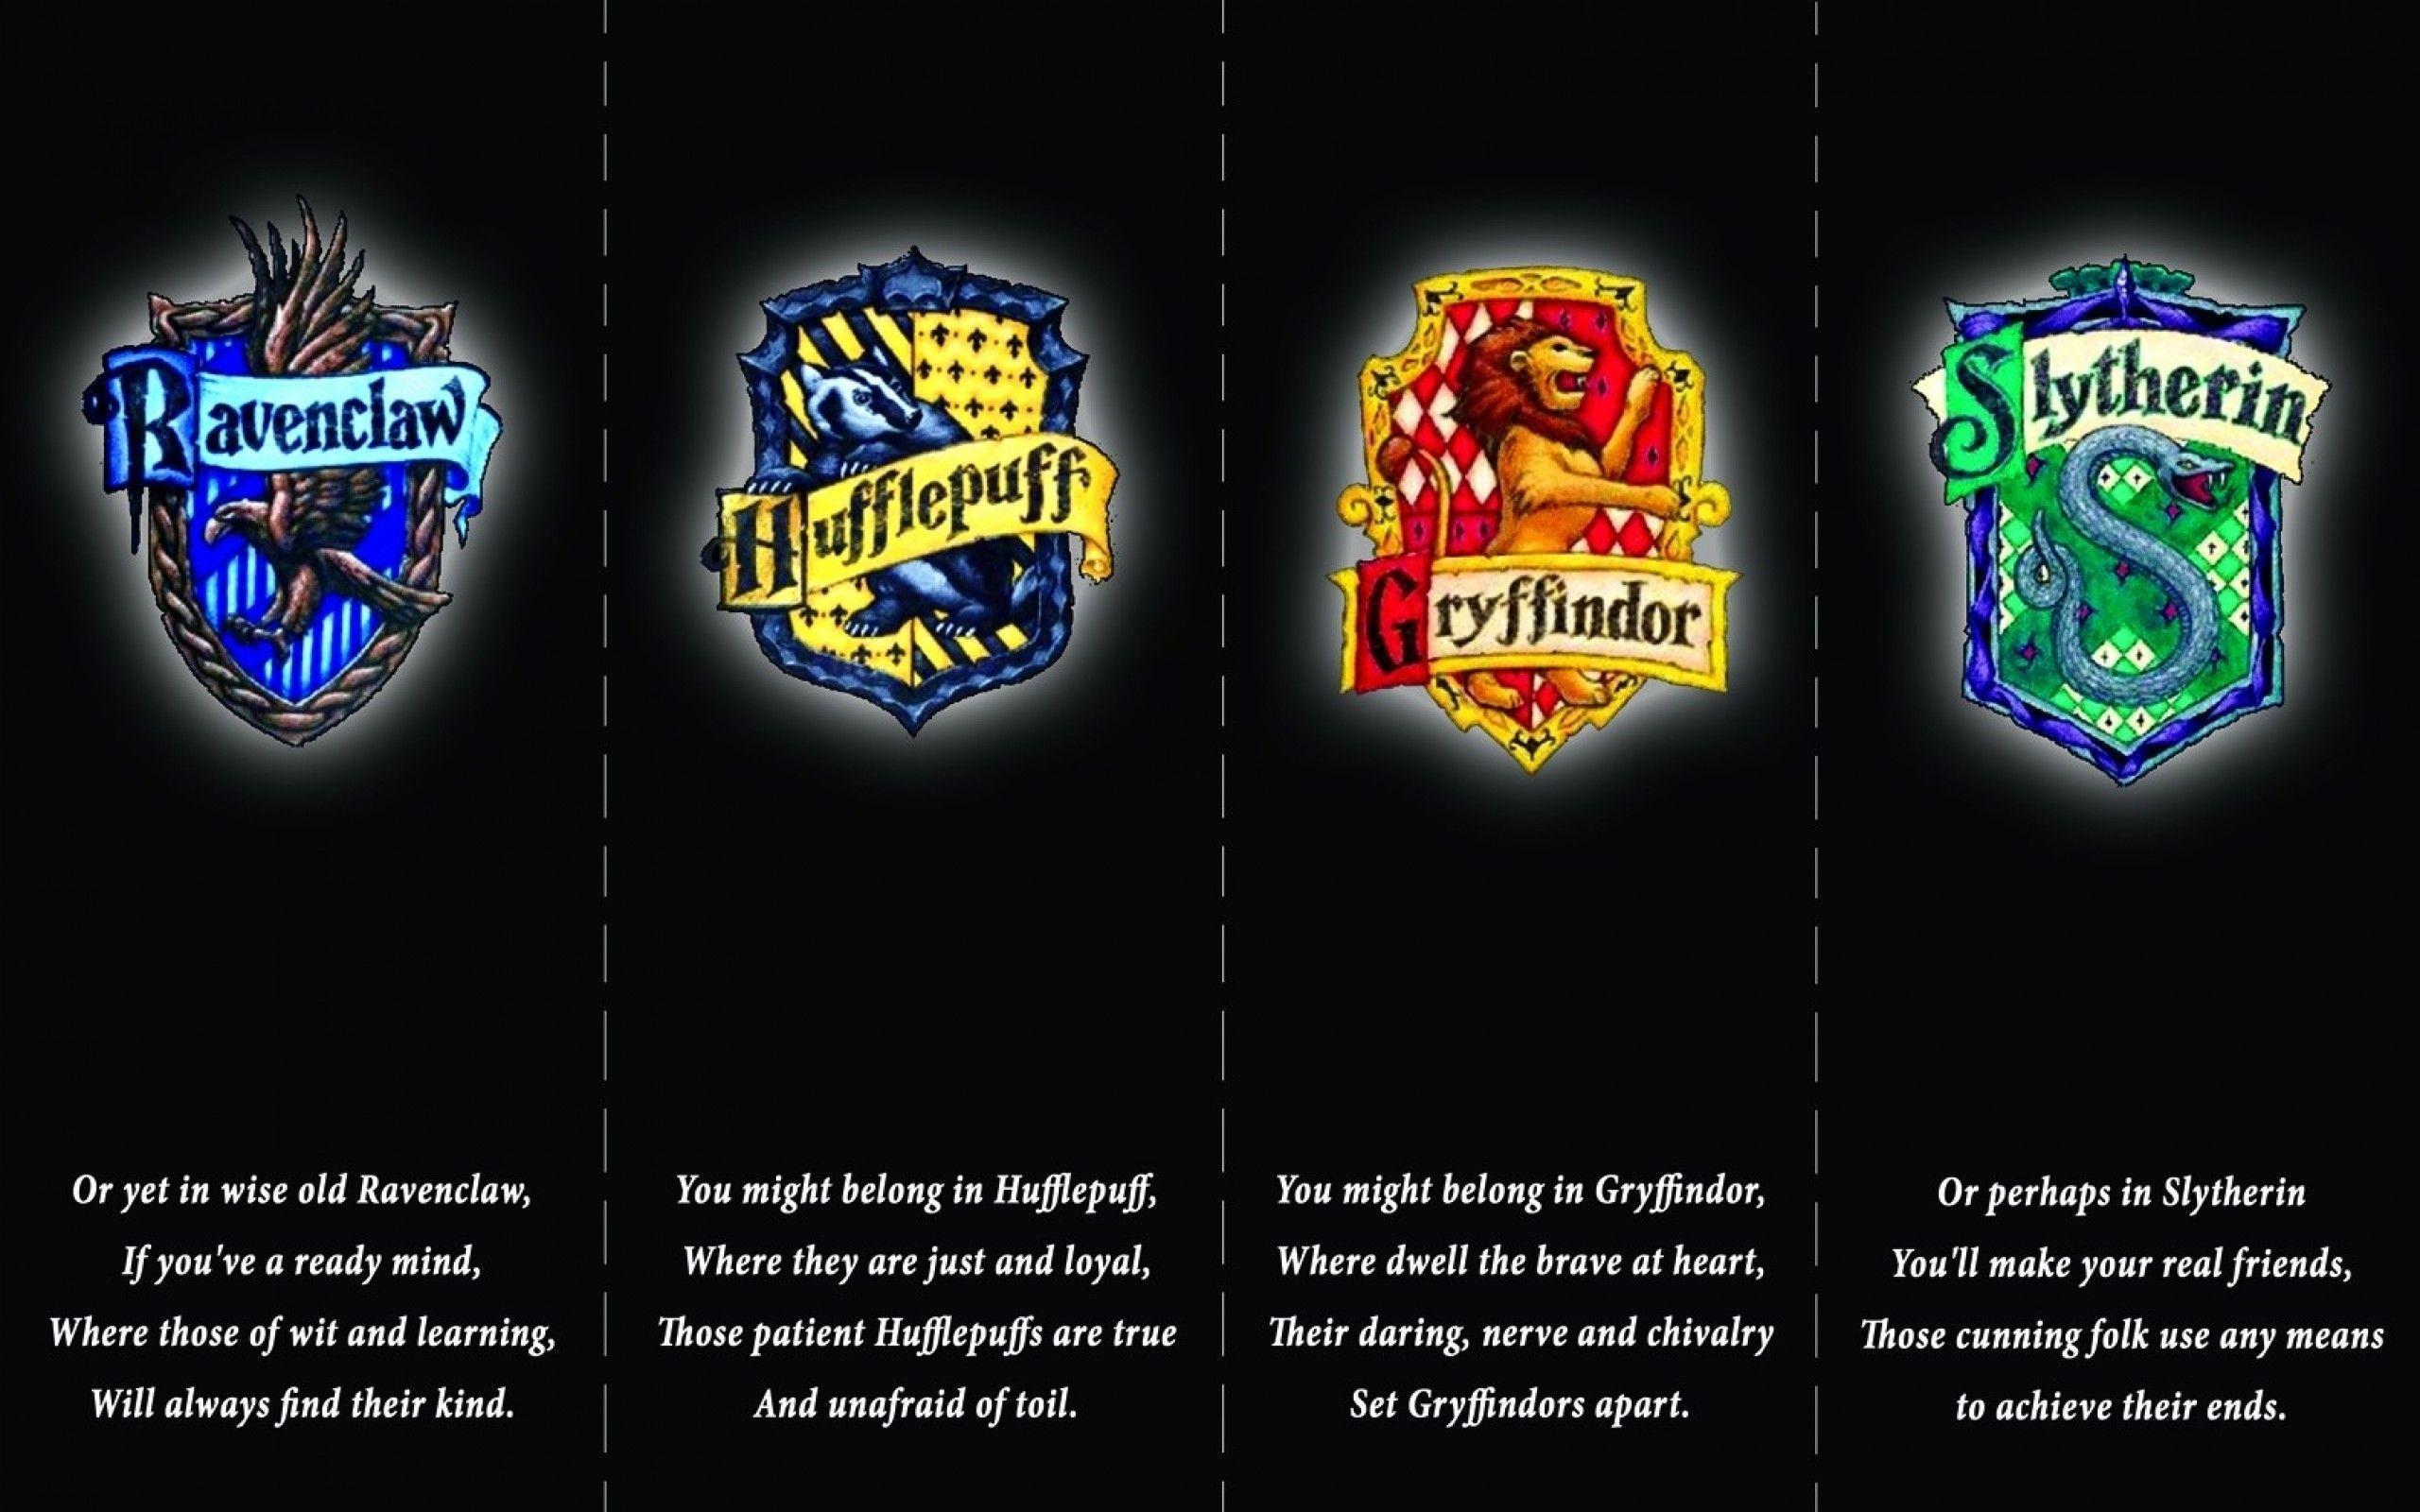 Harry Potter Gryffindor Laptop Wallpapers On Wallpaperdog